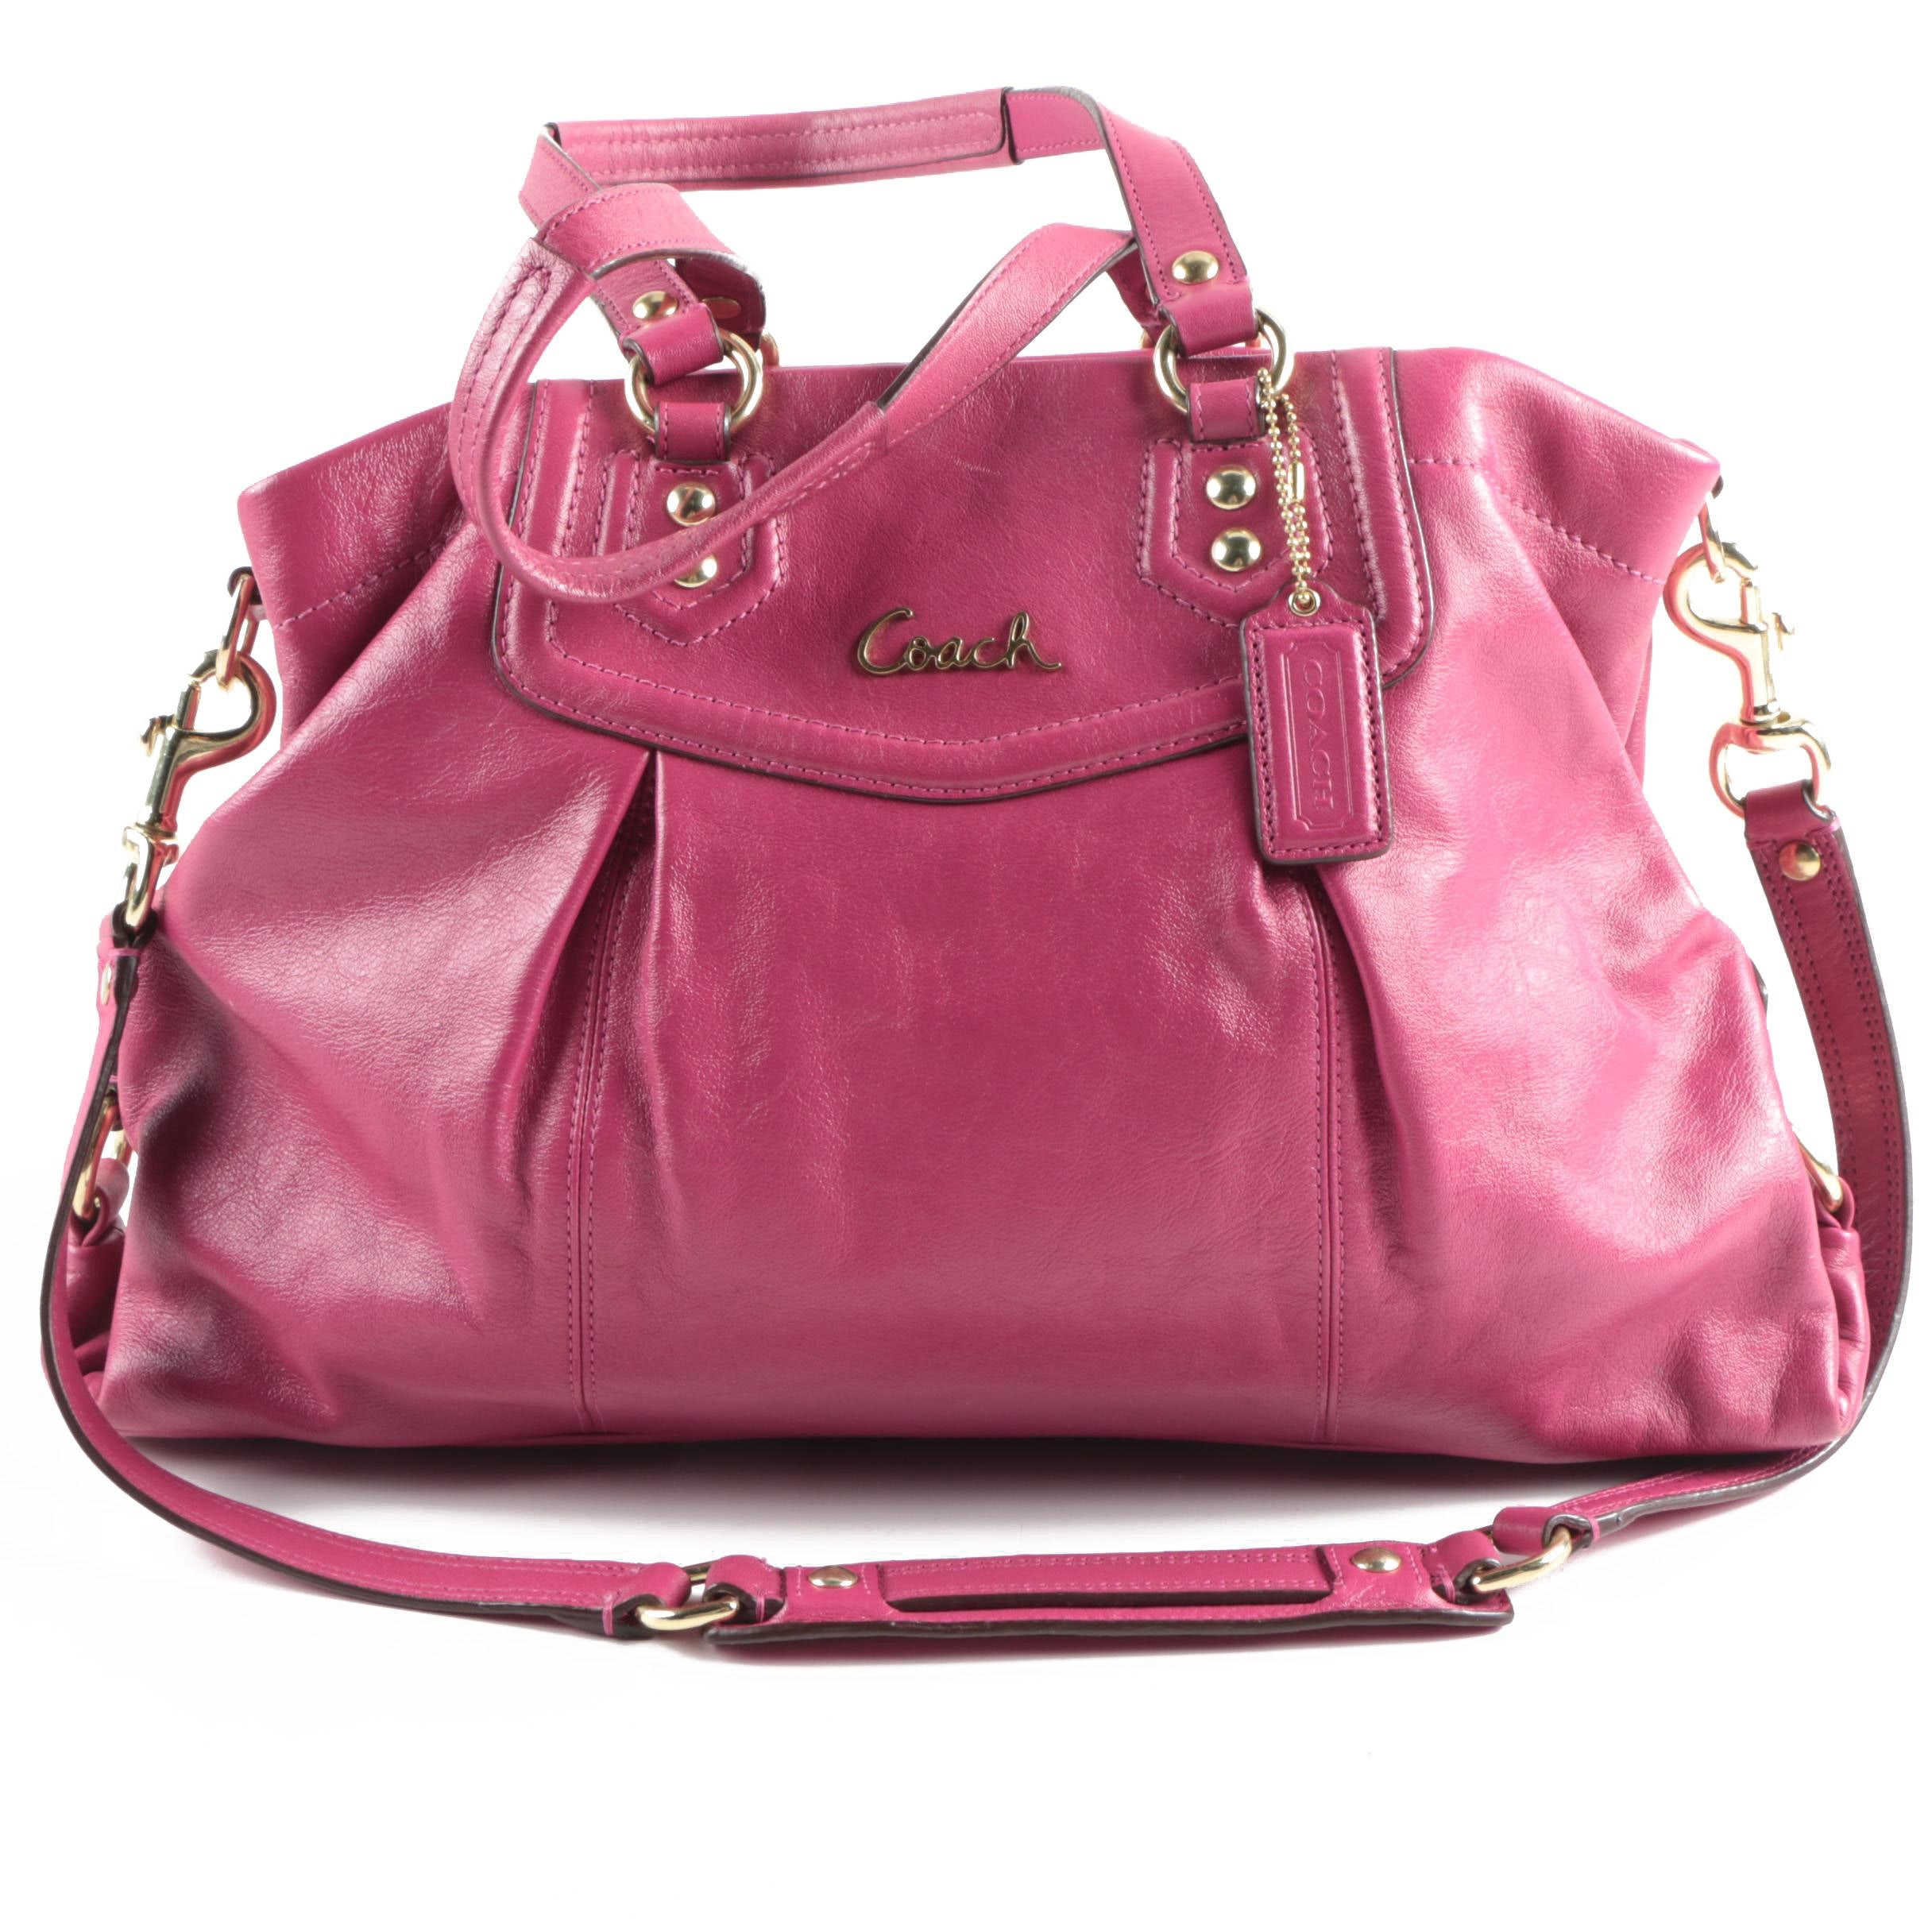 Coach Ashley Fuchsia Leather Carryall